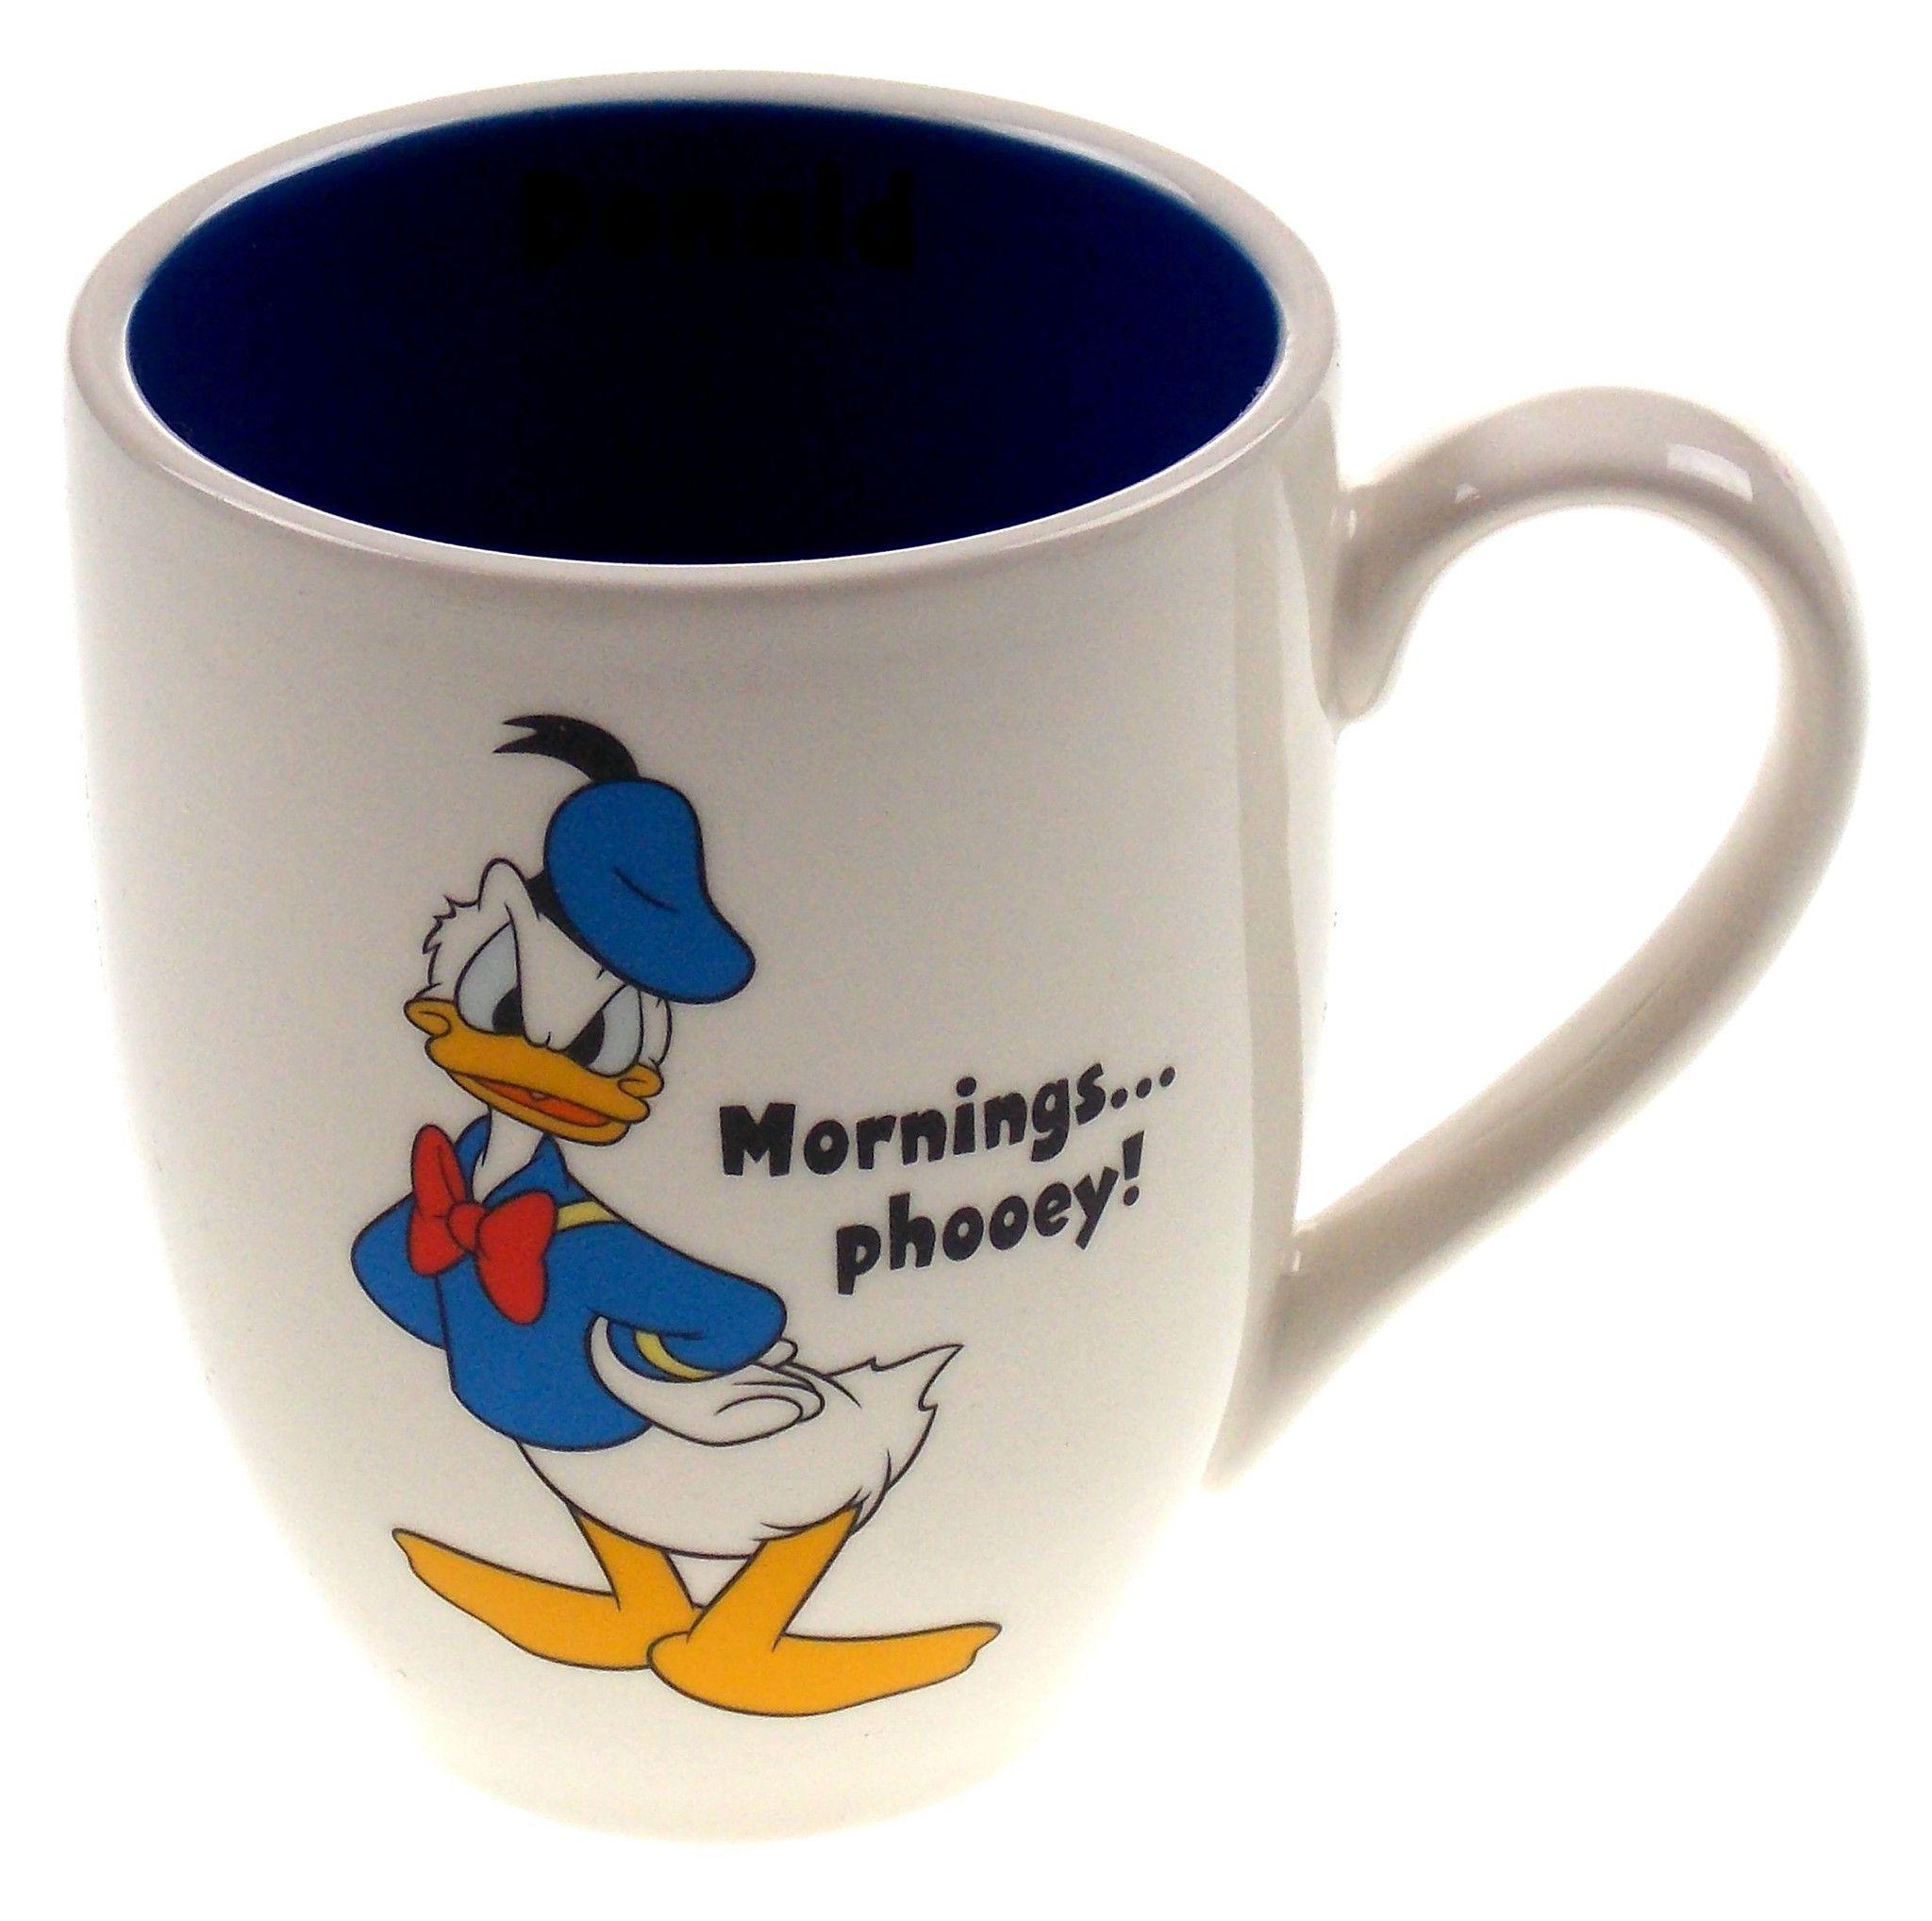 Disney Coffee White Duck MorningsphooeyIs Donald Mug QdrEoCWxBe